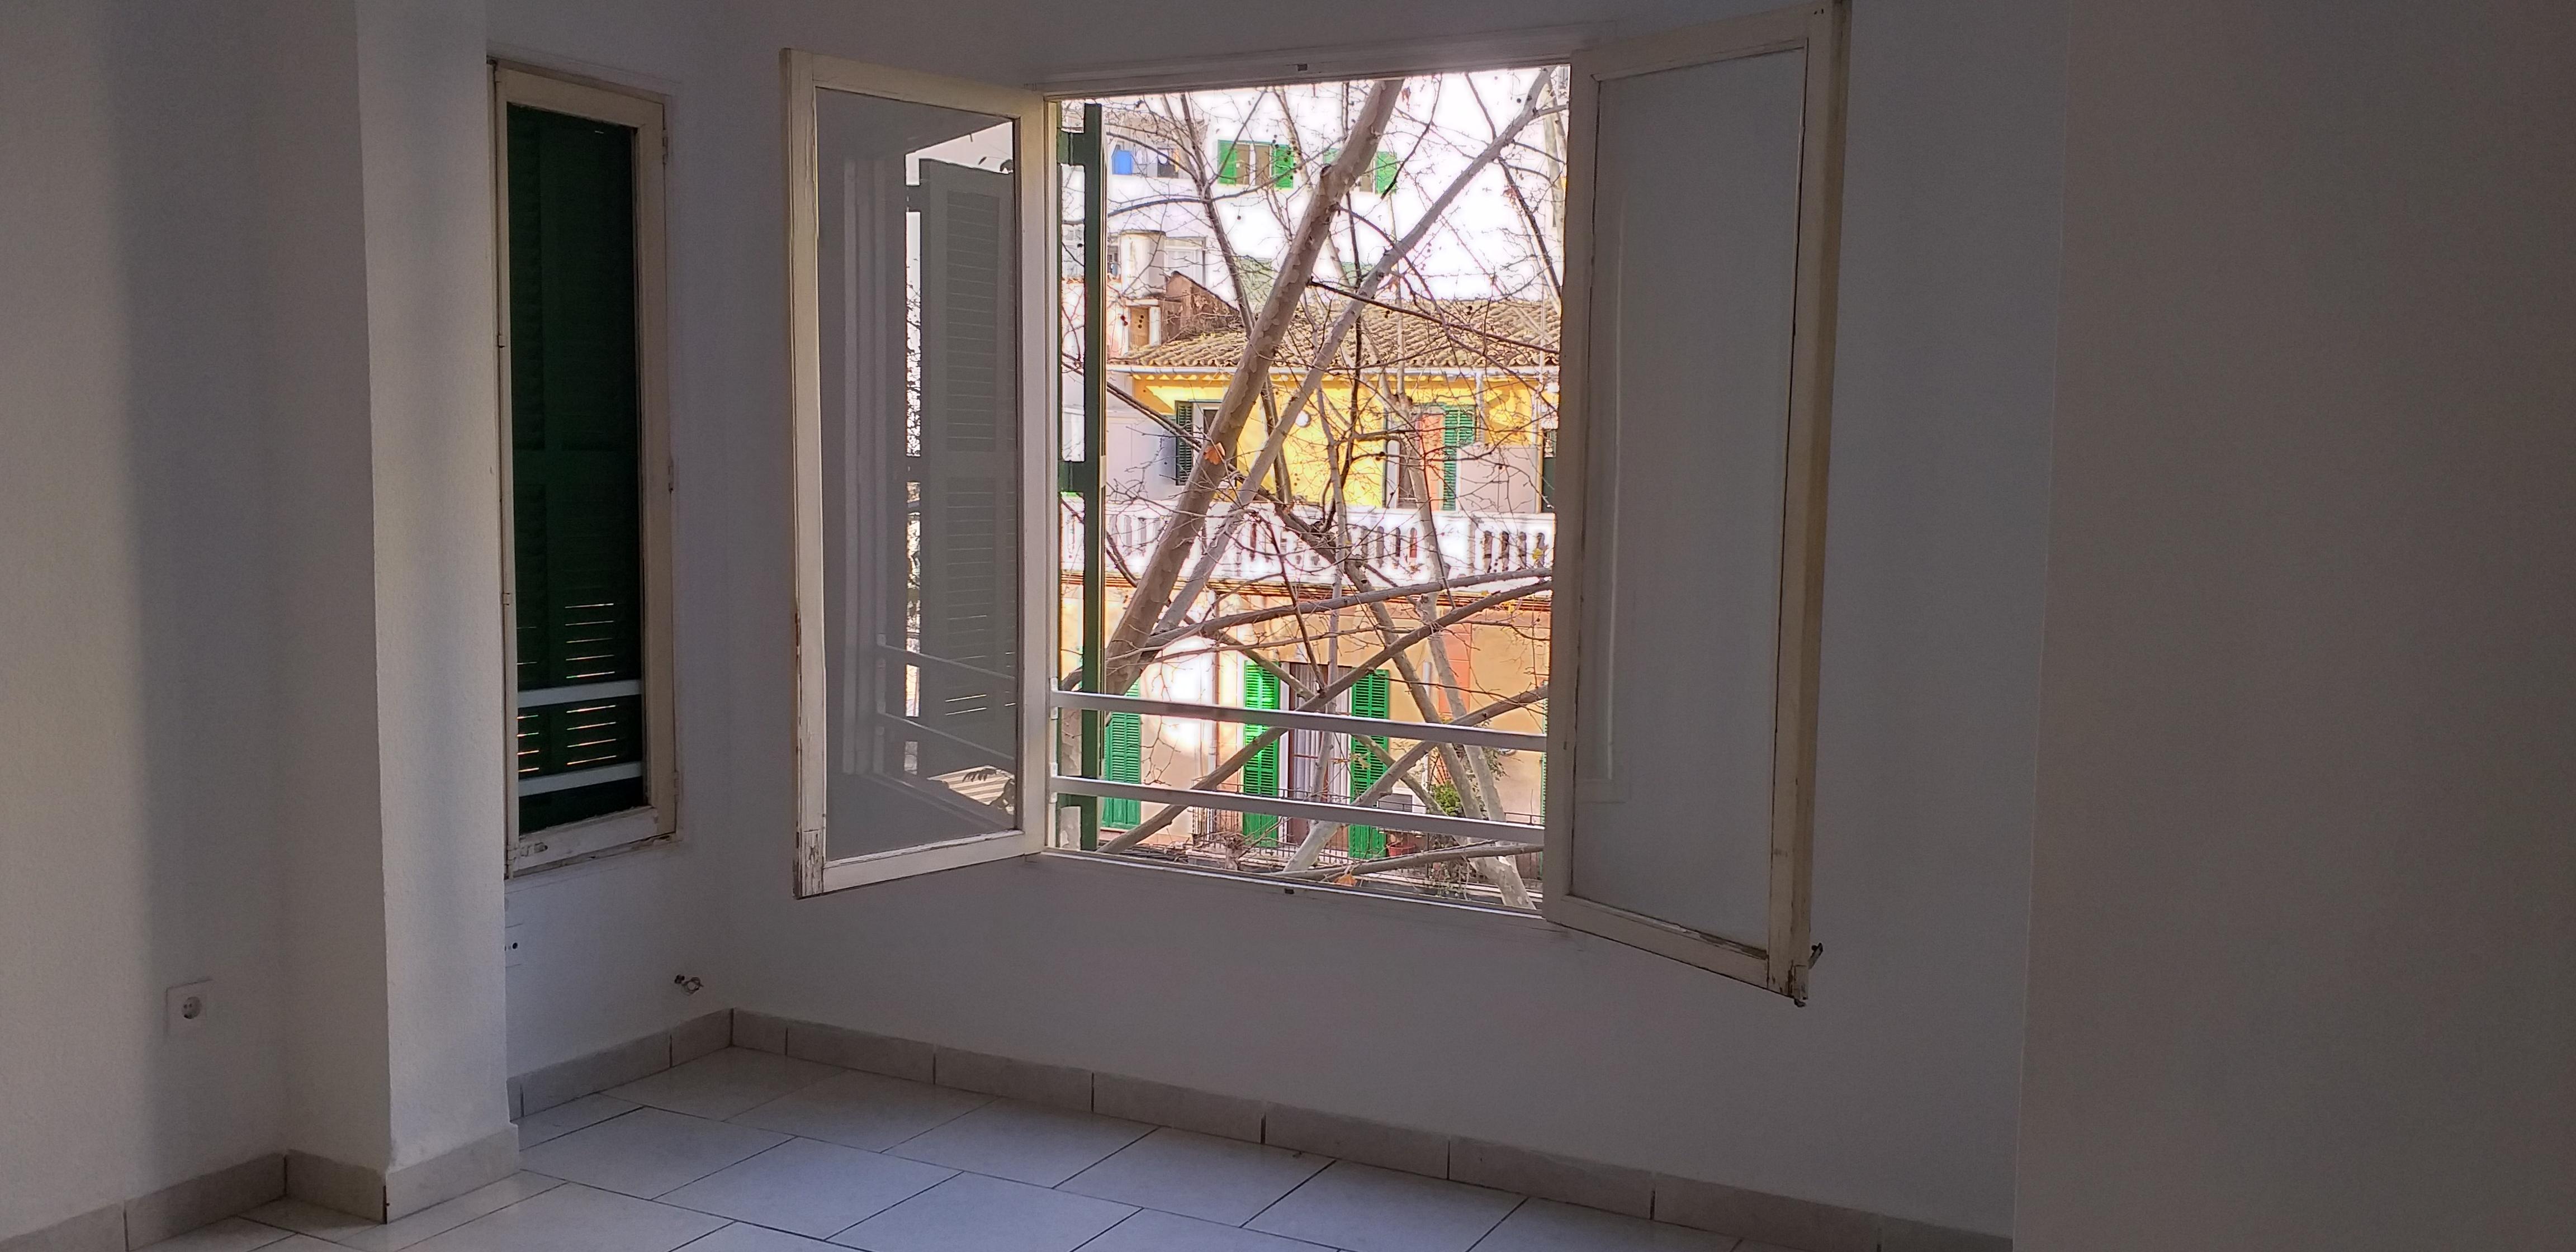 Alquiler Piso  C/ balanguera. Solvia inmobiliaria - piso palma de mallorca